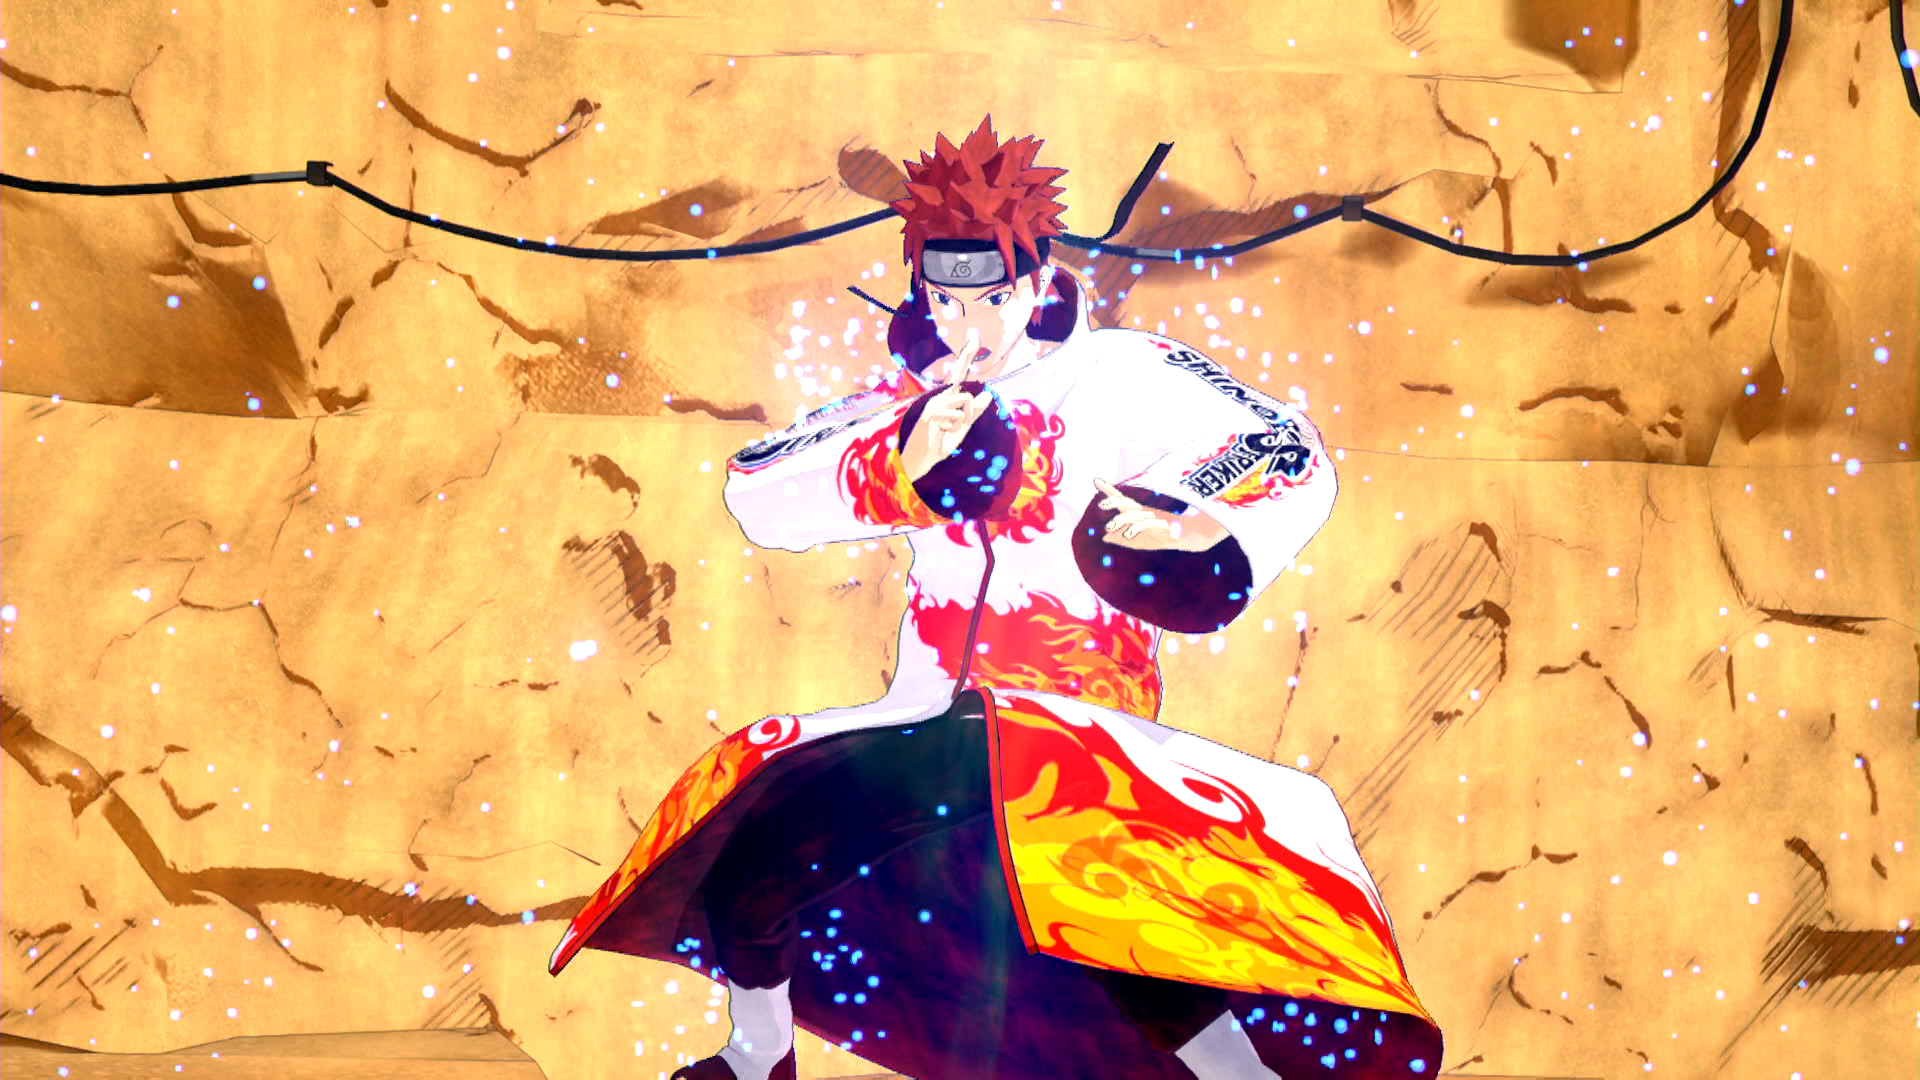 KHAiHOM.com - NTBSS: Shinobi Strikers Coat: White (Gender-Neutral)